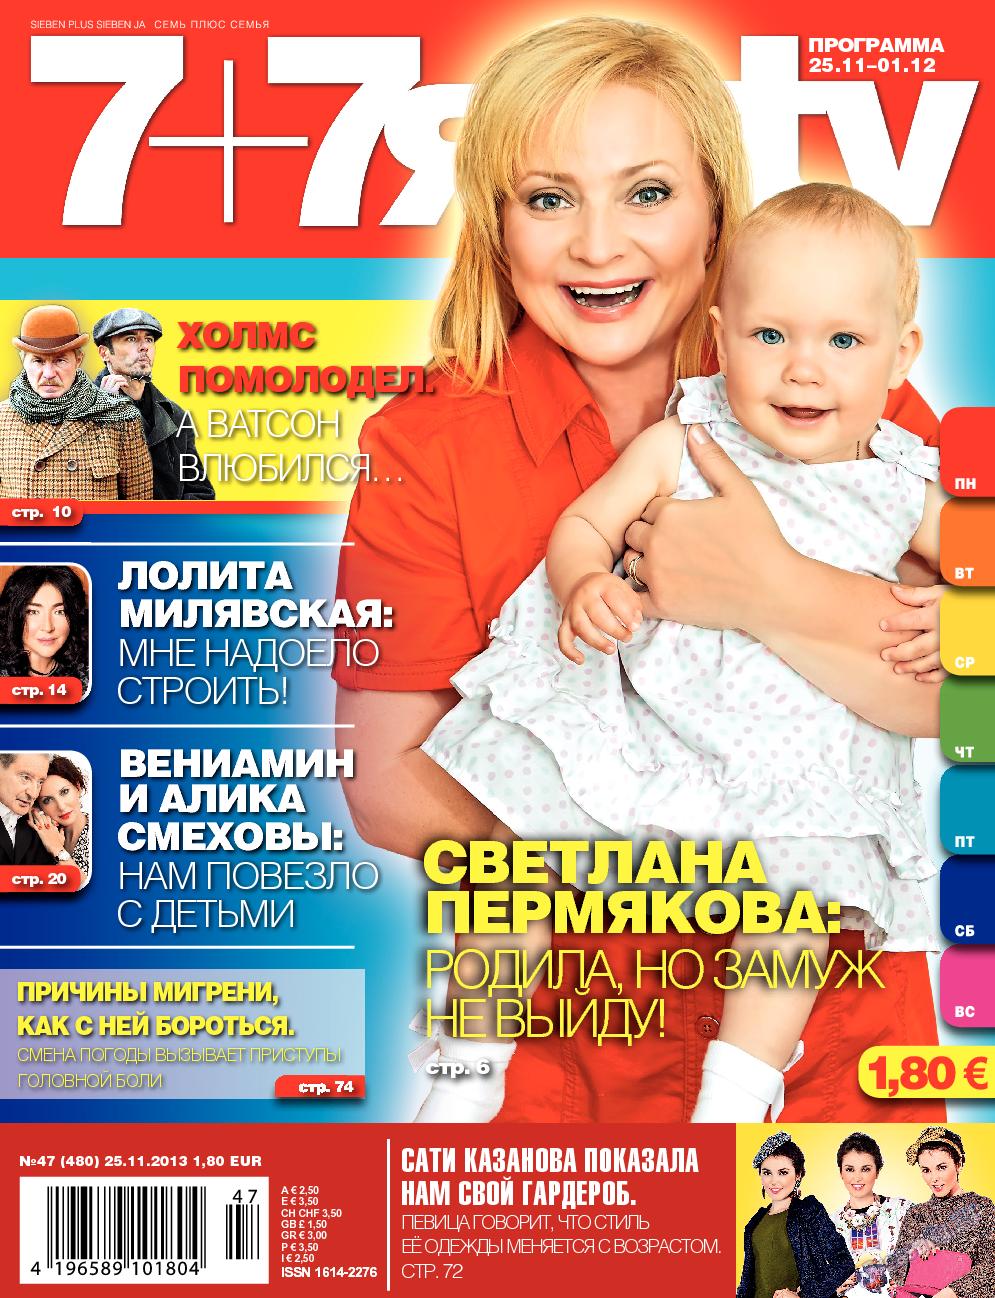 7плюс7я (журнал). 2013 год, номер 47, стр. 1